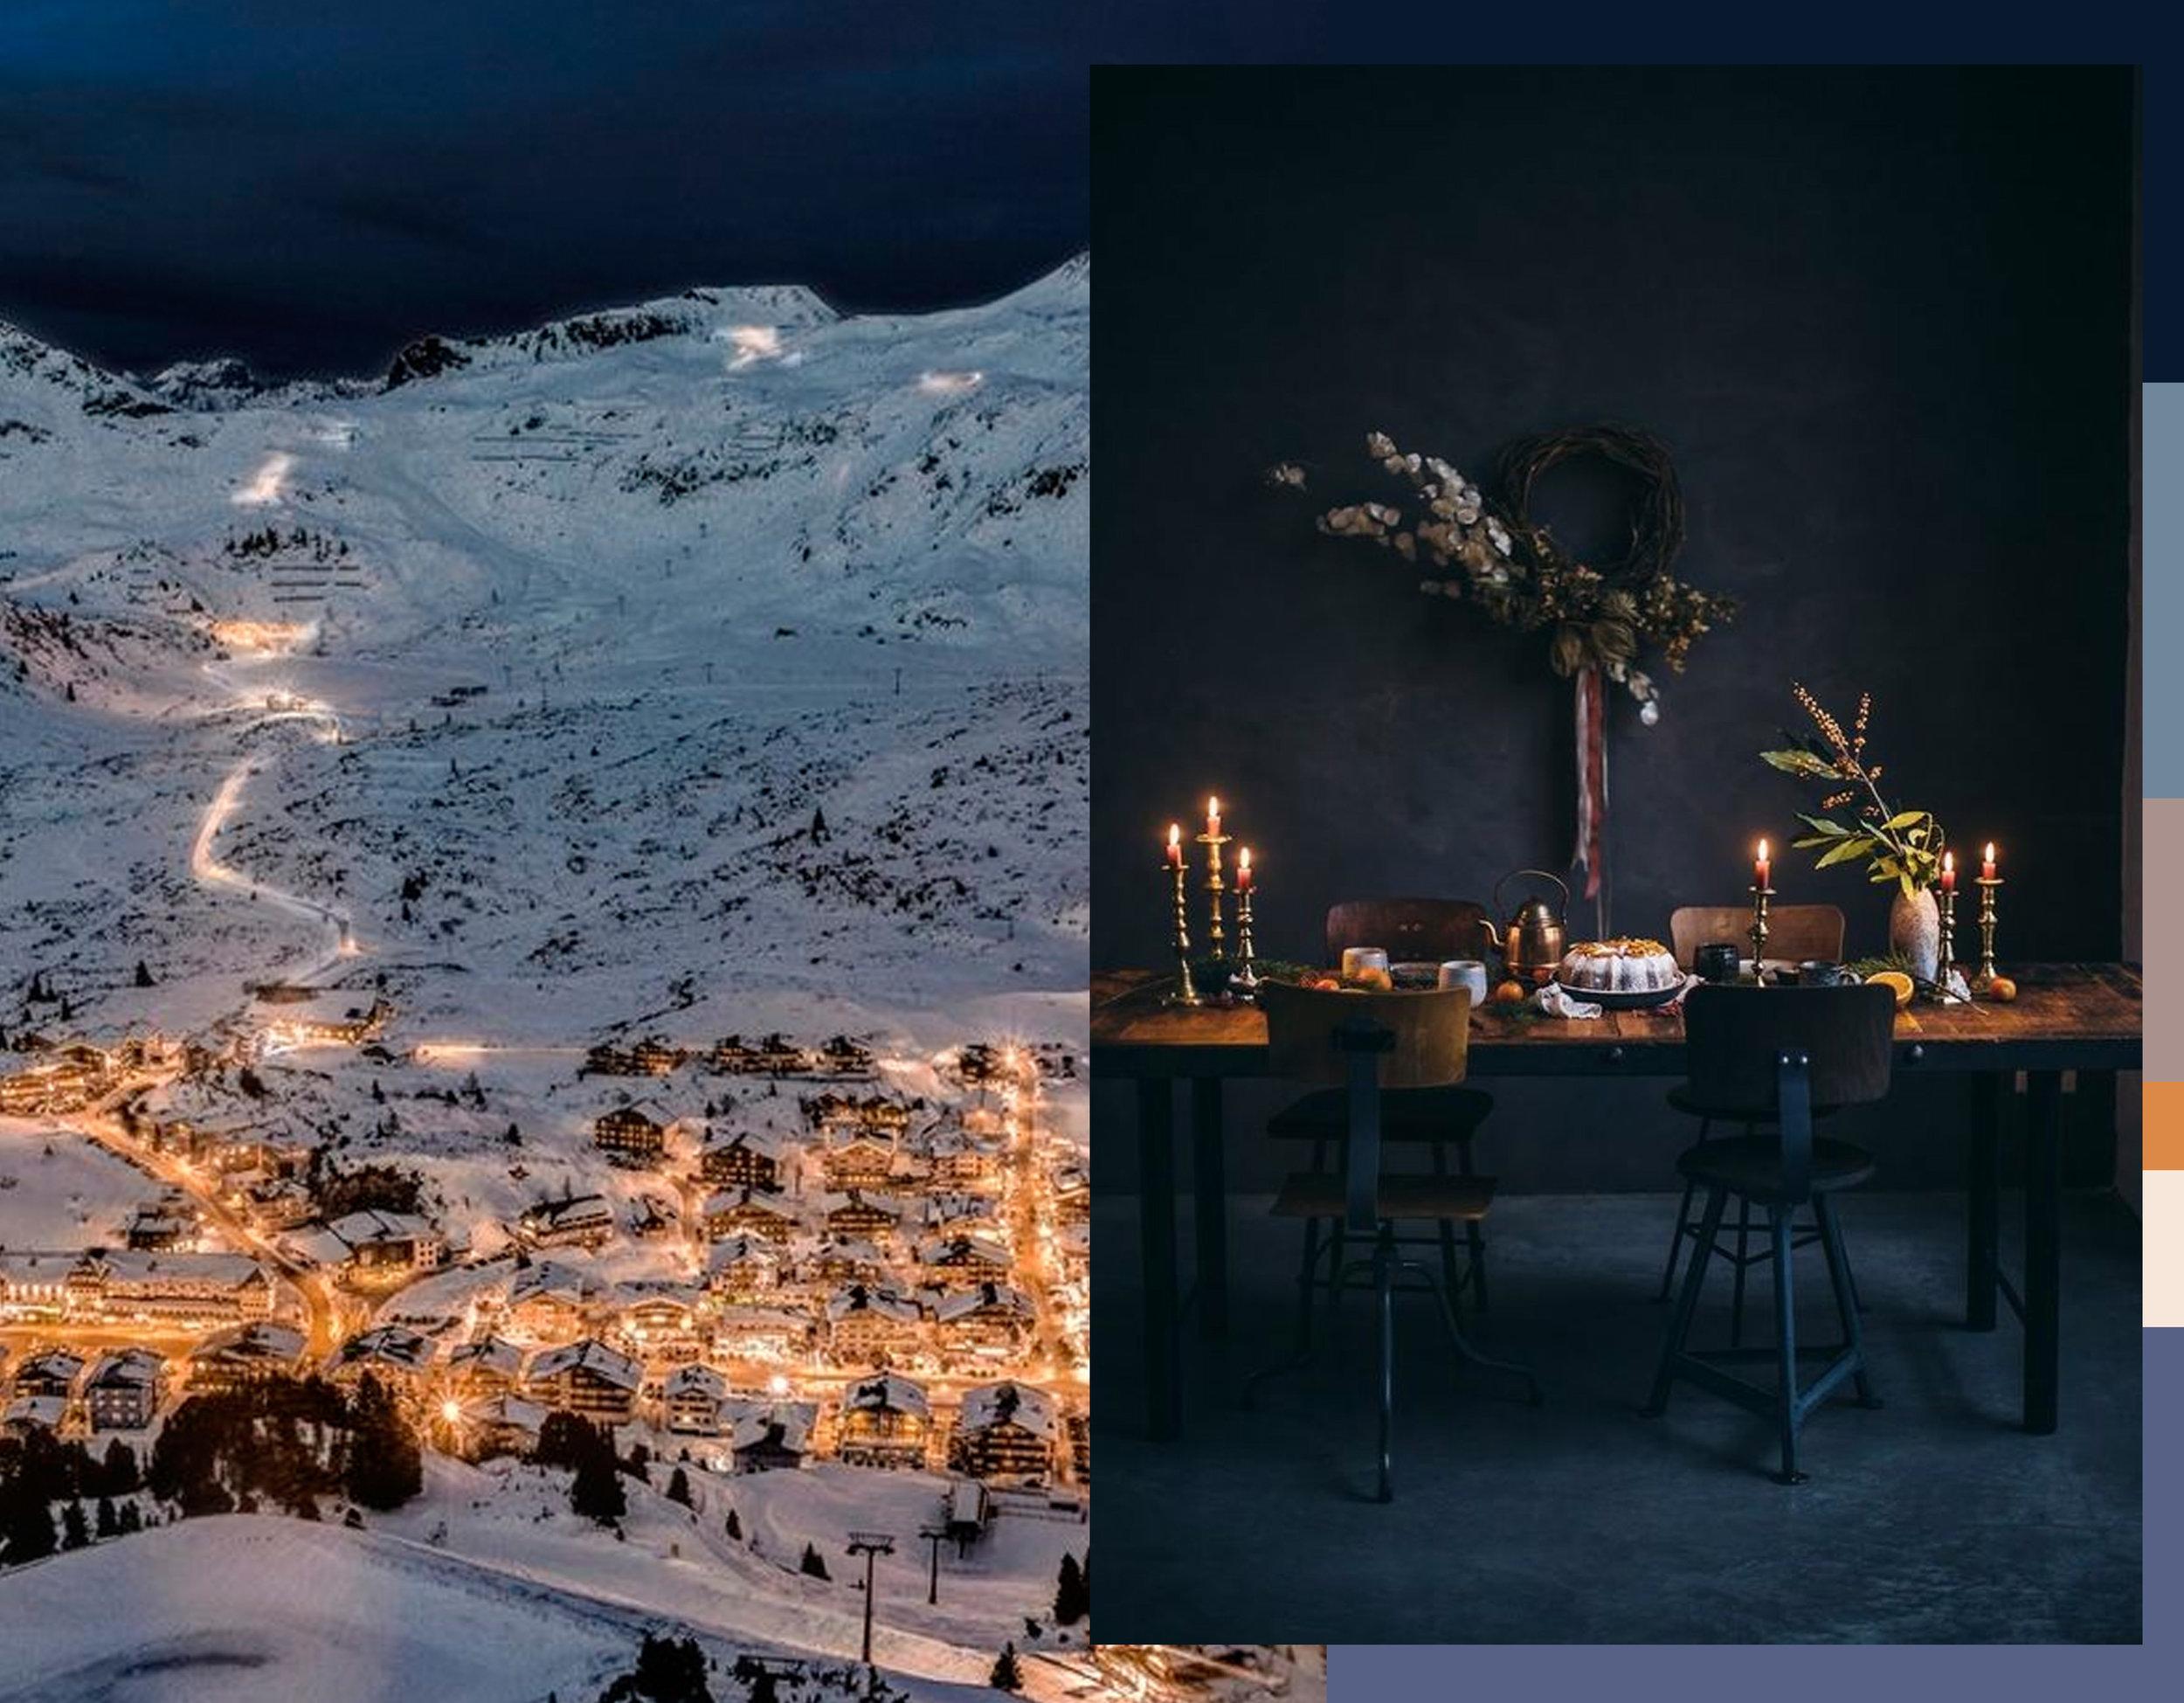 image Austria via  Architecture and Design  - interior via  Our Food Stories